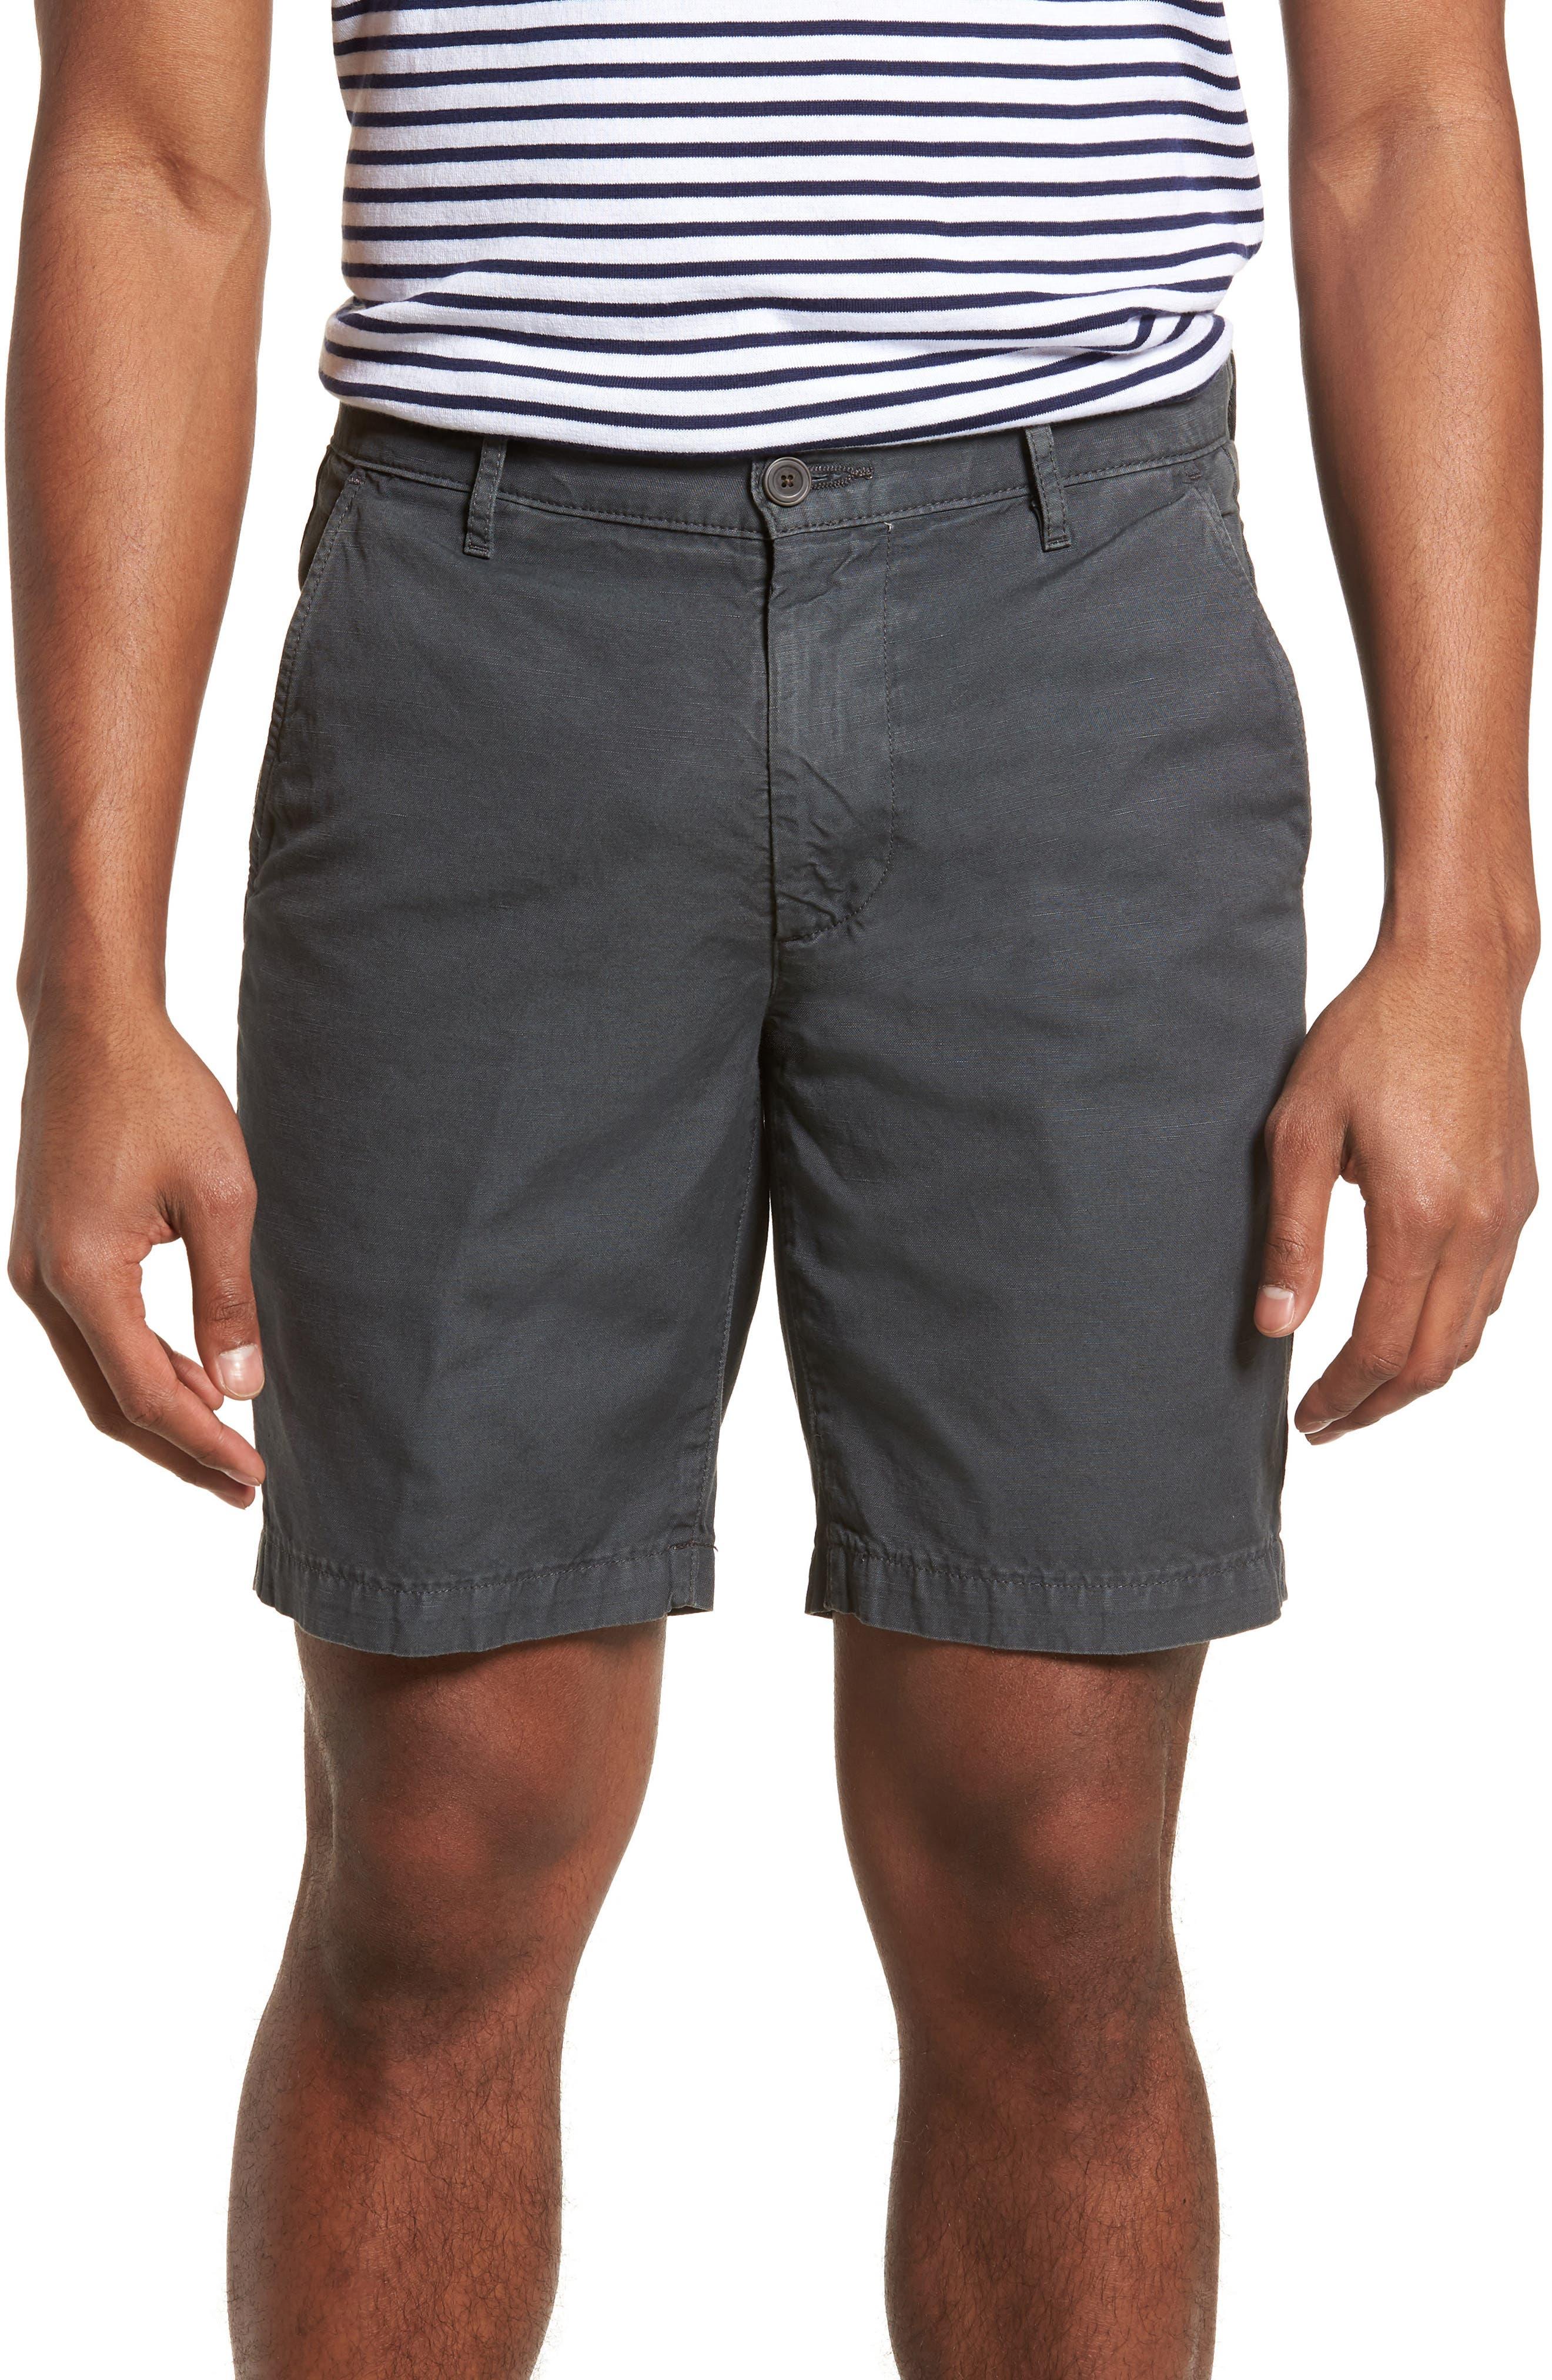 Wanderer Slim Fit Cotton & Linen Shorts,                         Main,                         color, SULFUR SMOKE GREY